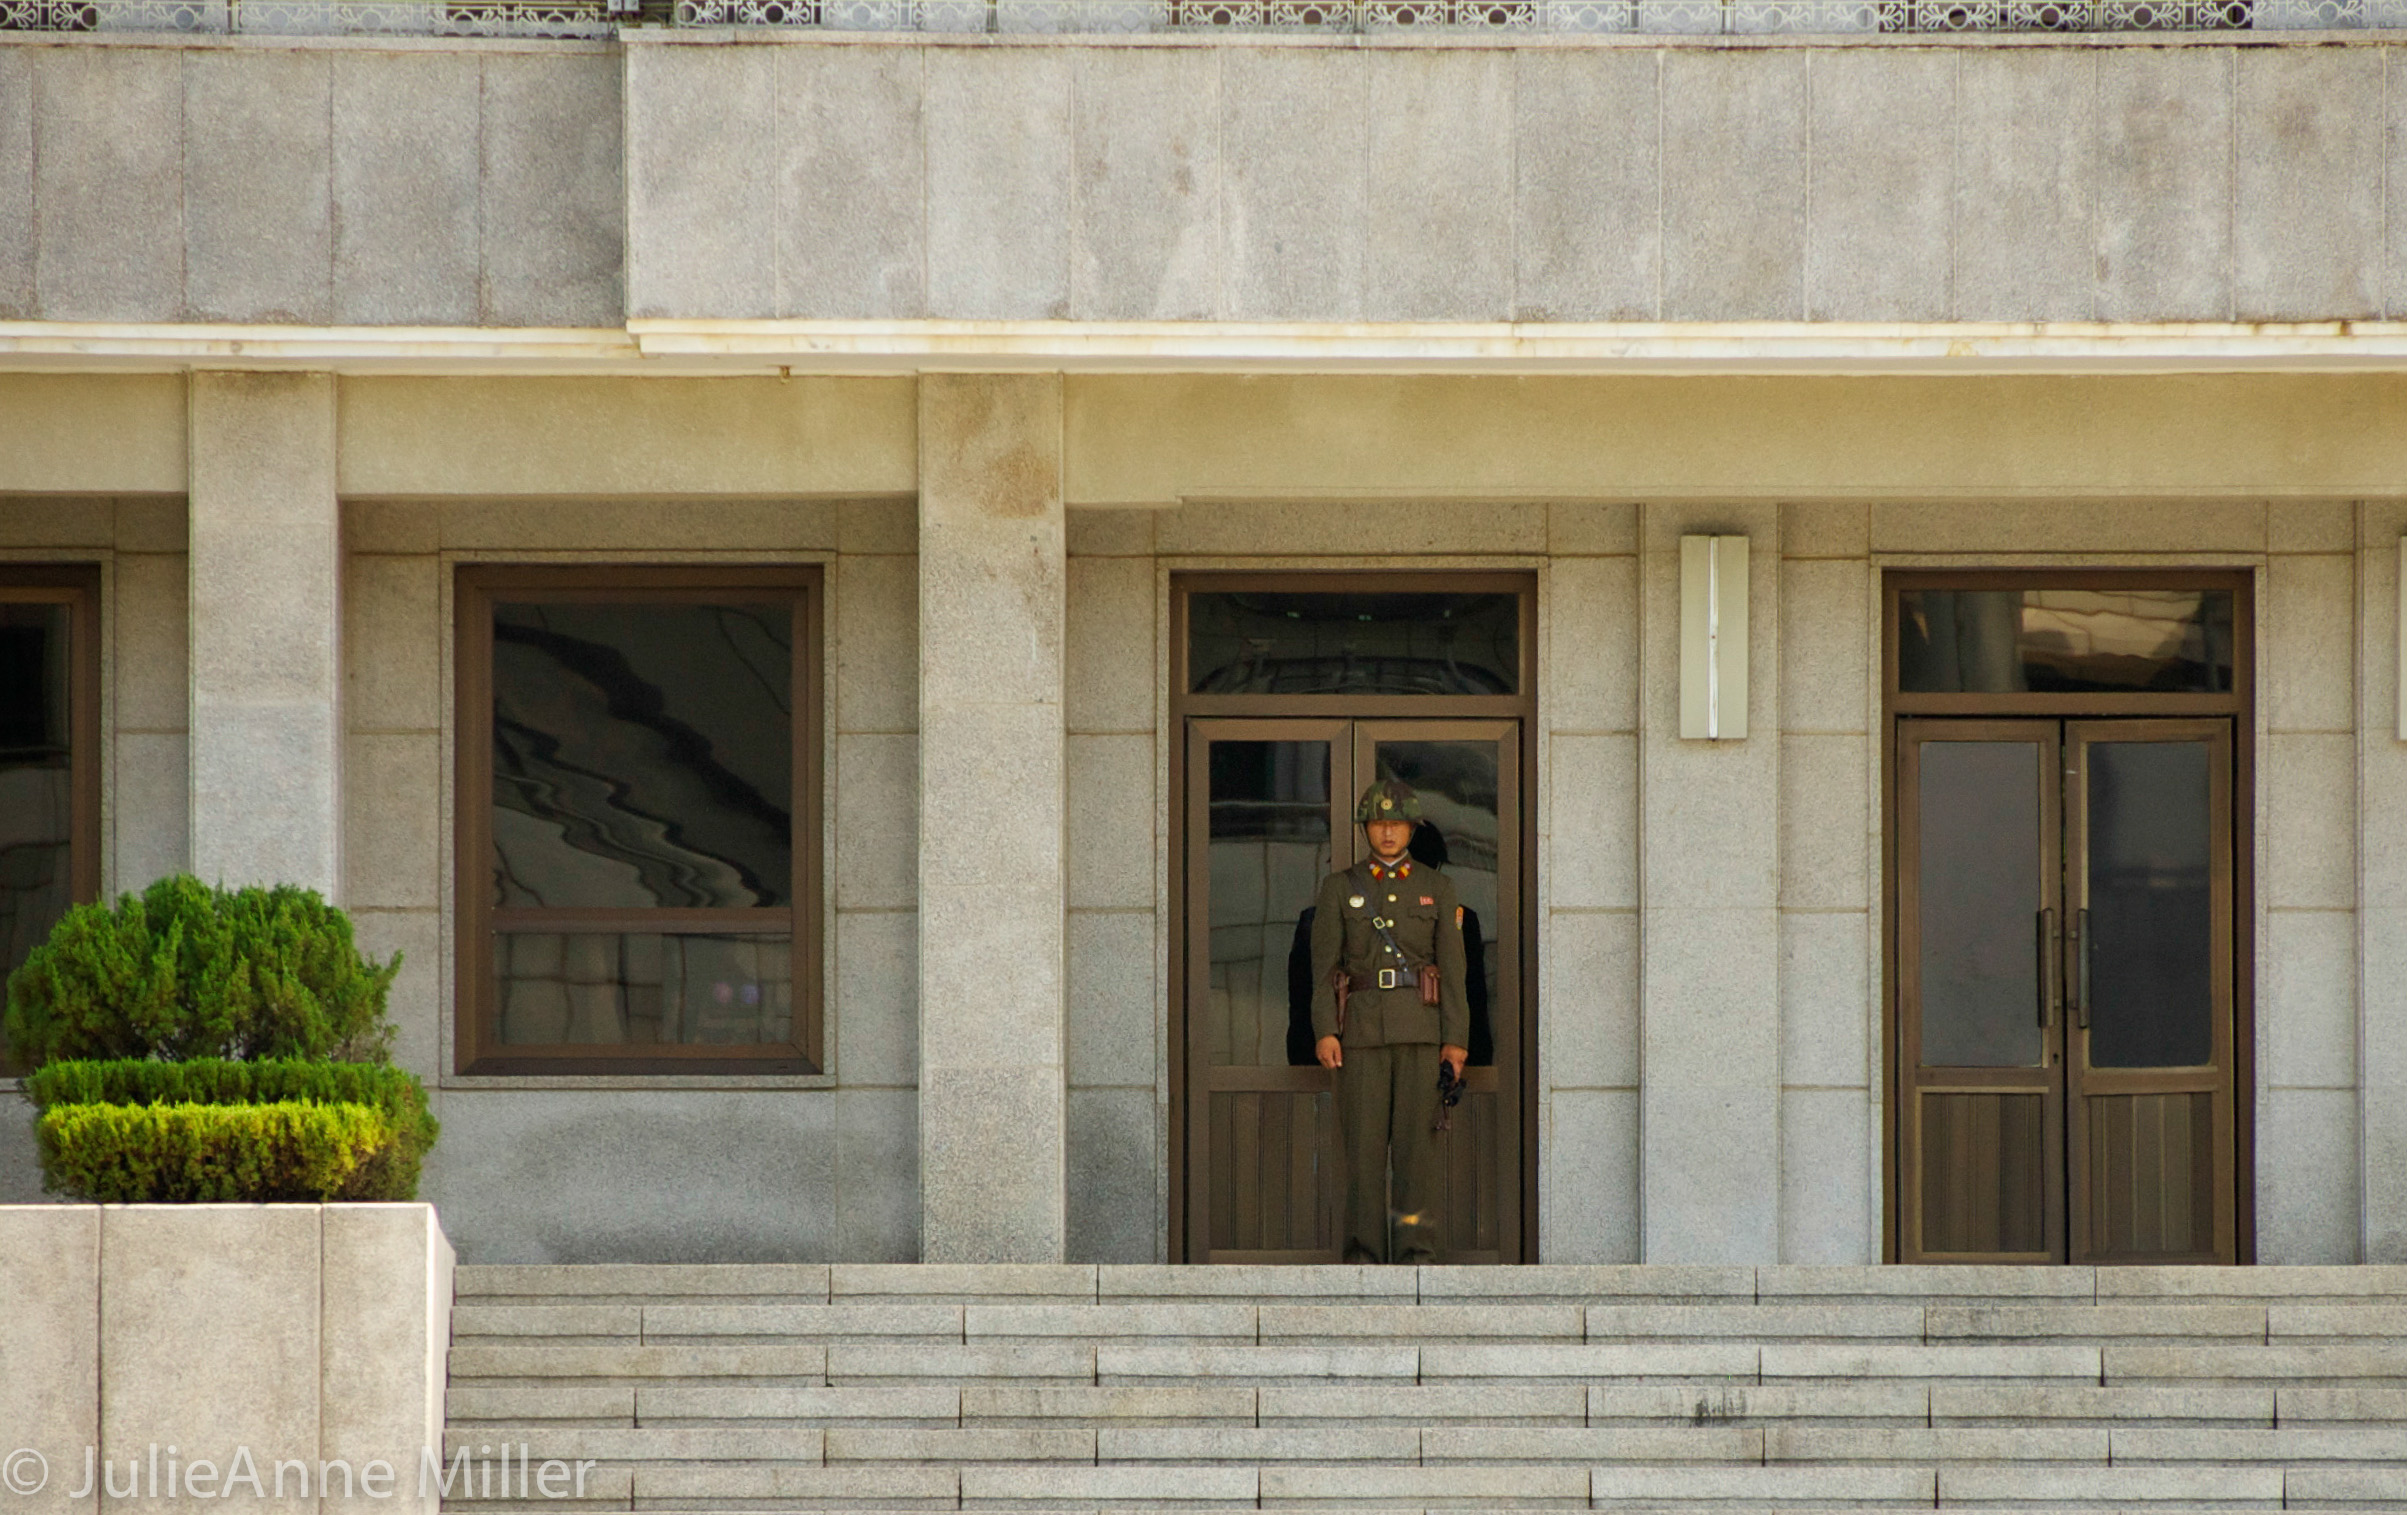 Korean People's Army Soldier